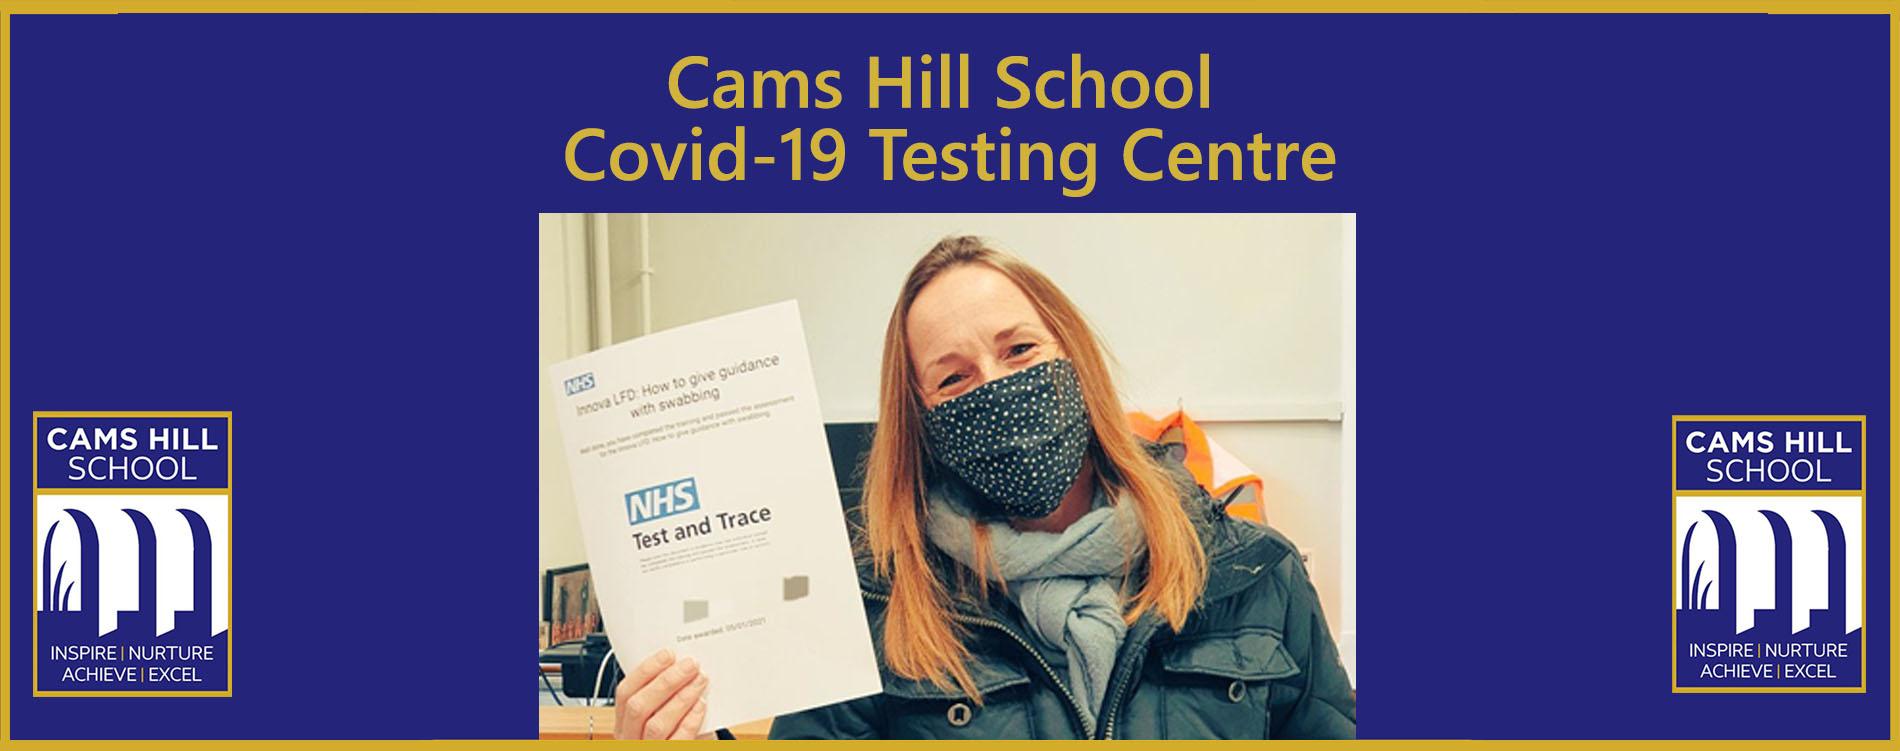 Cams Hill School